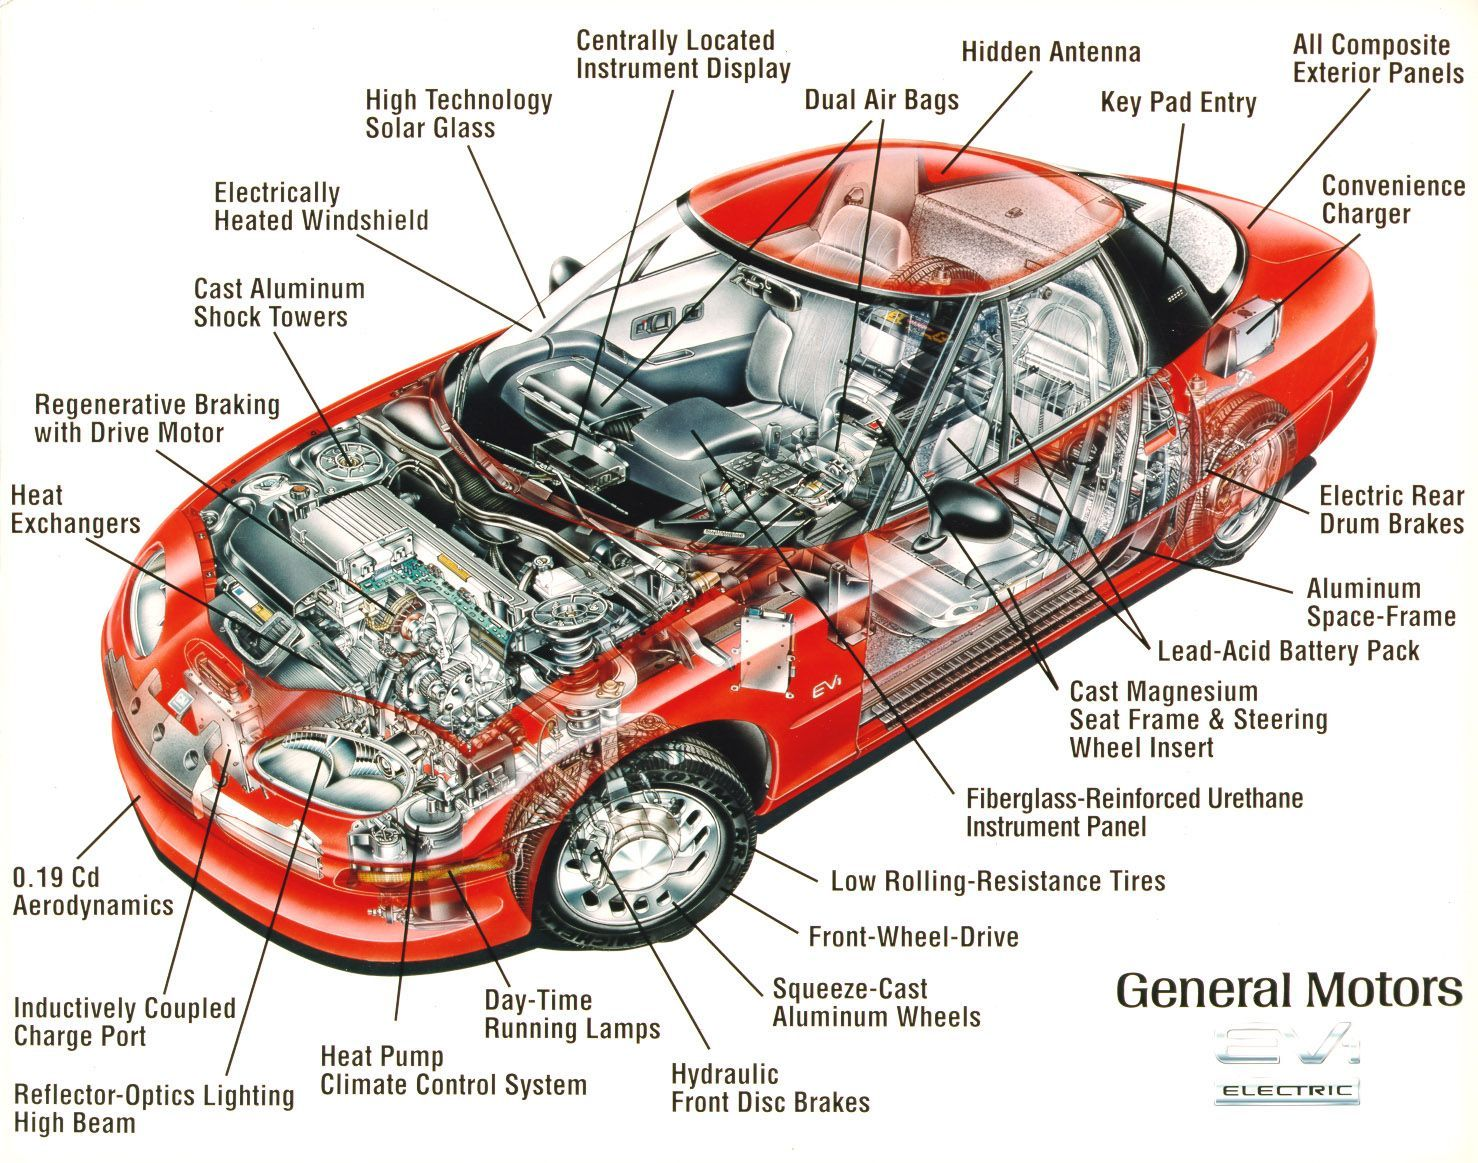 medium resolution of basic car diagram wiring diagram source car interior dashboard diagram basic car engine parts diagram general